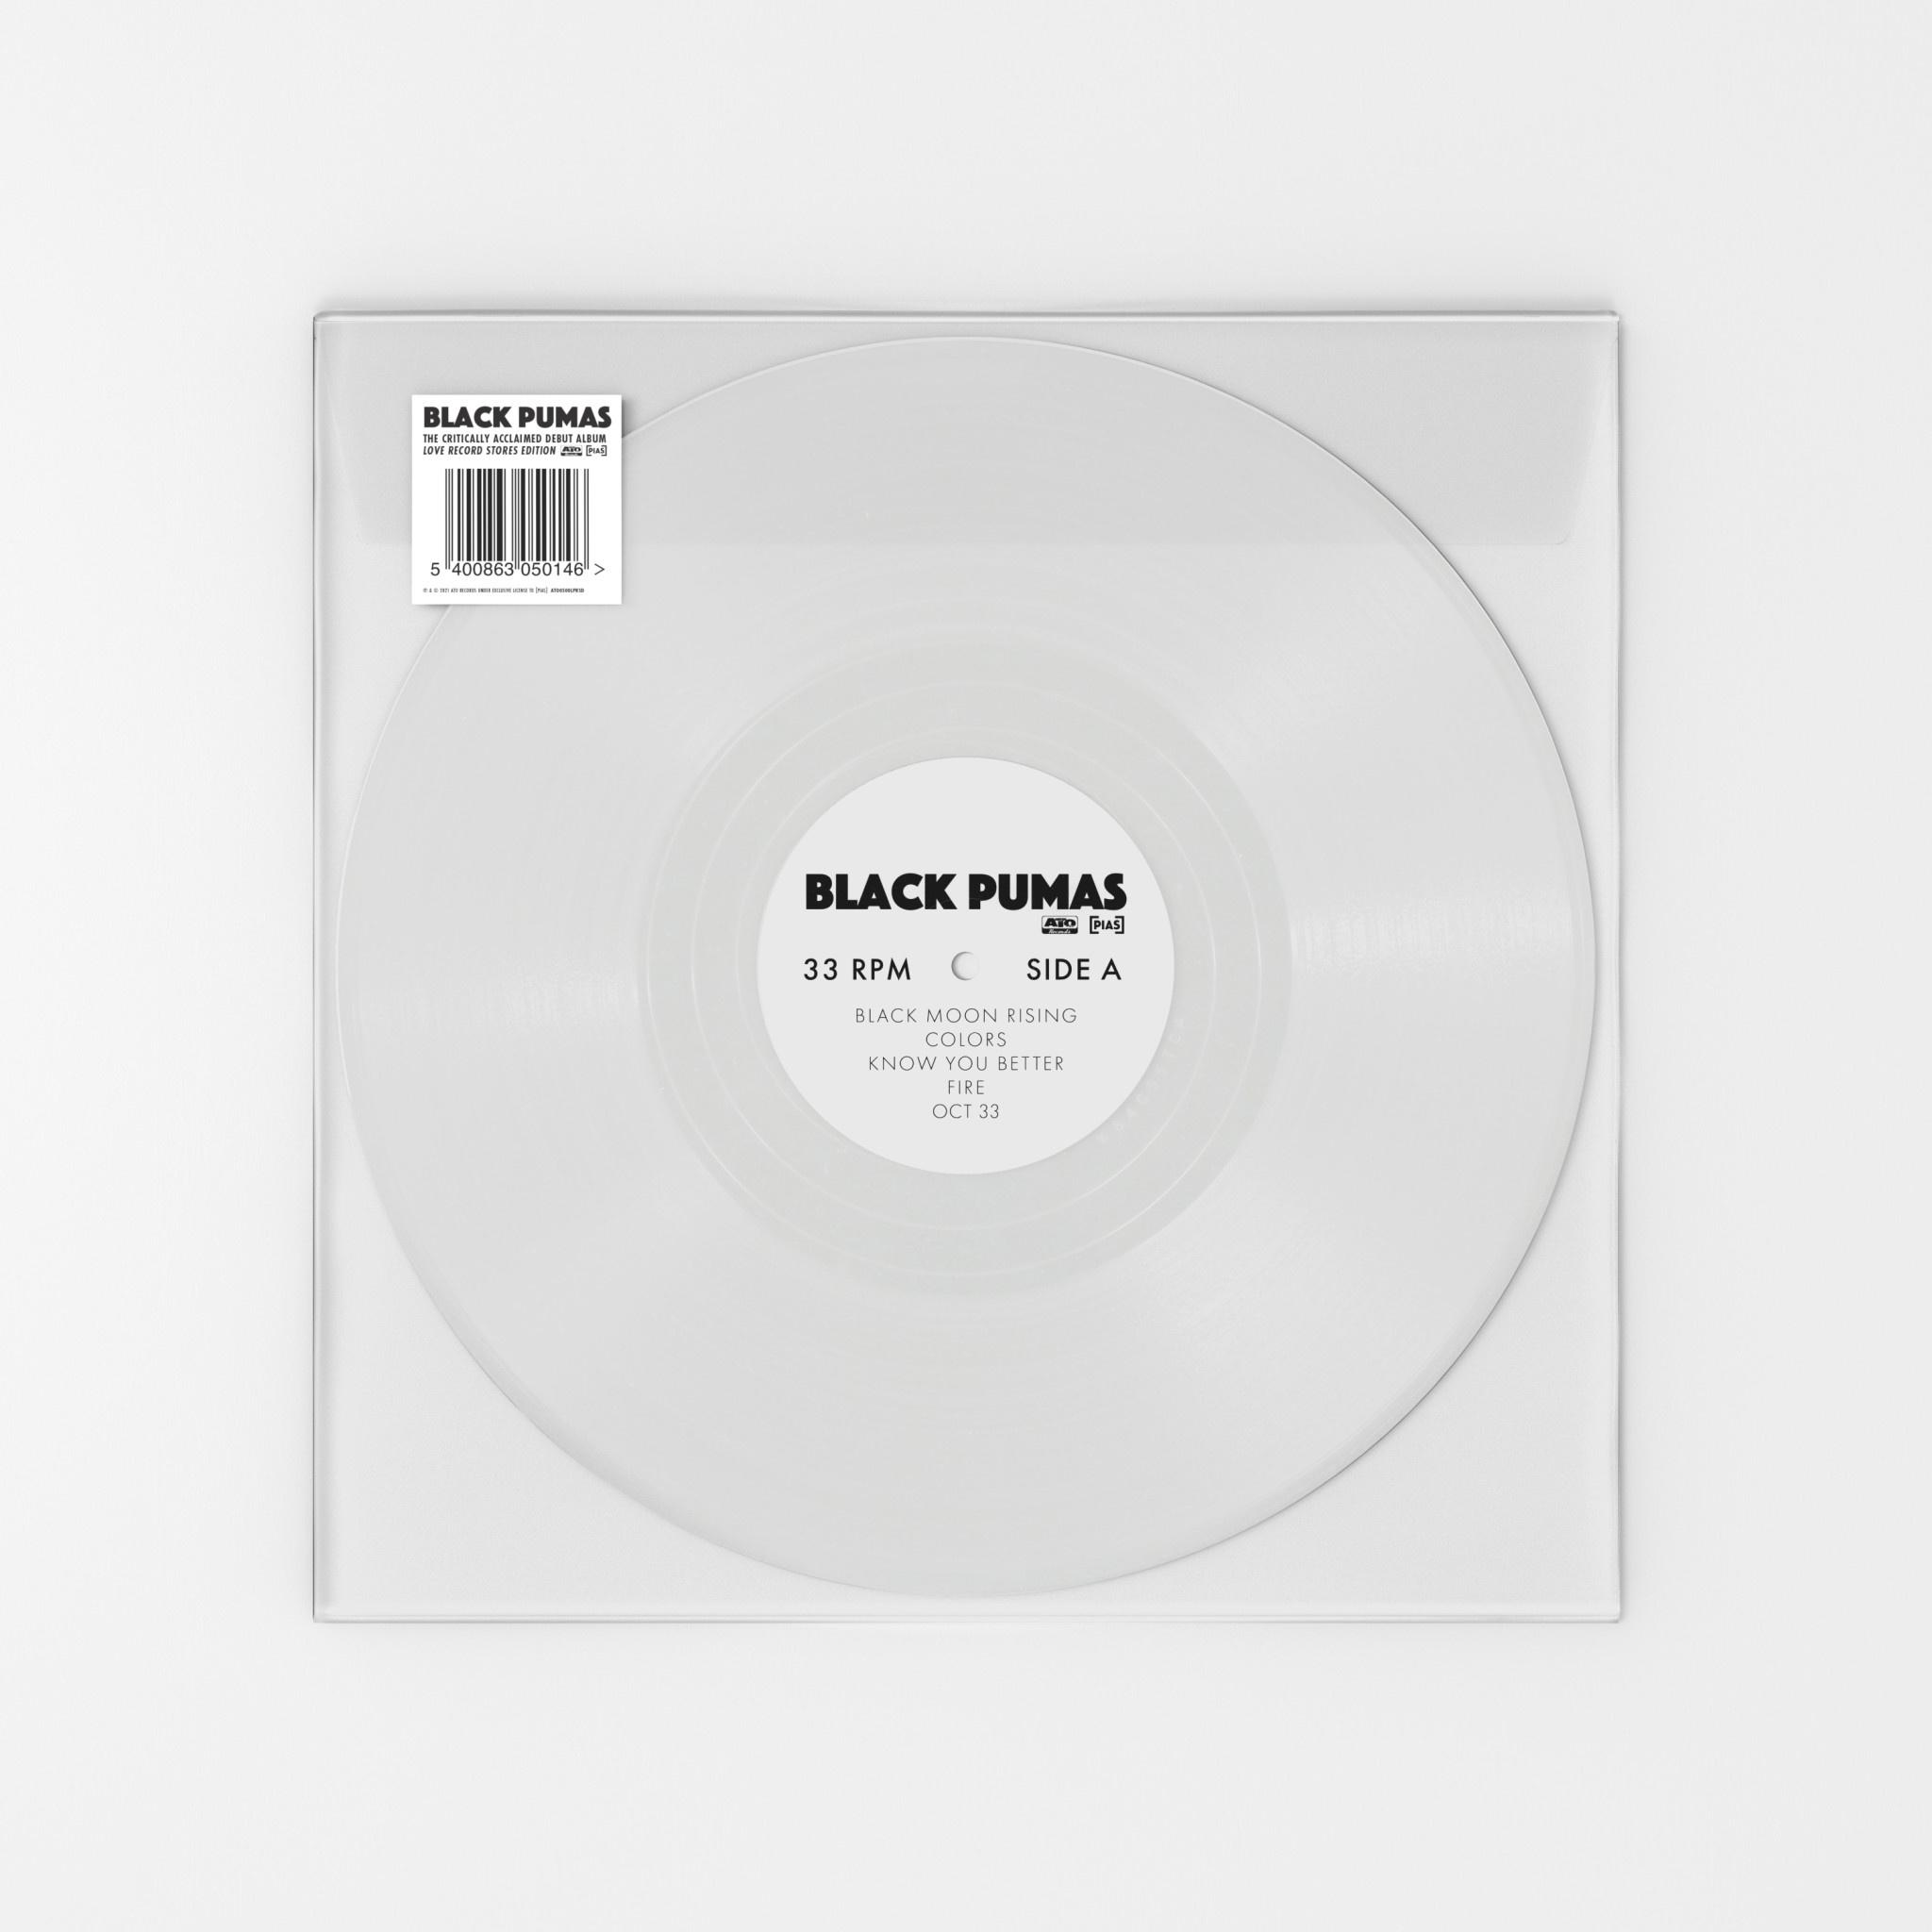 ATO Records Black Pumas - Black Pumas (LRS 2021)